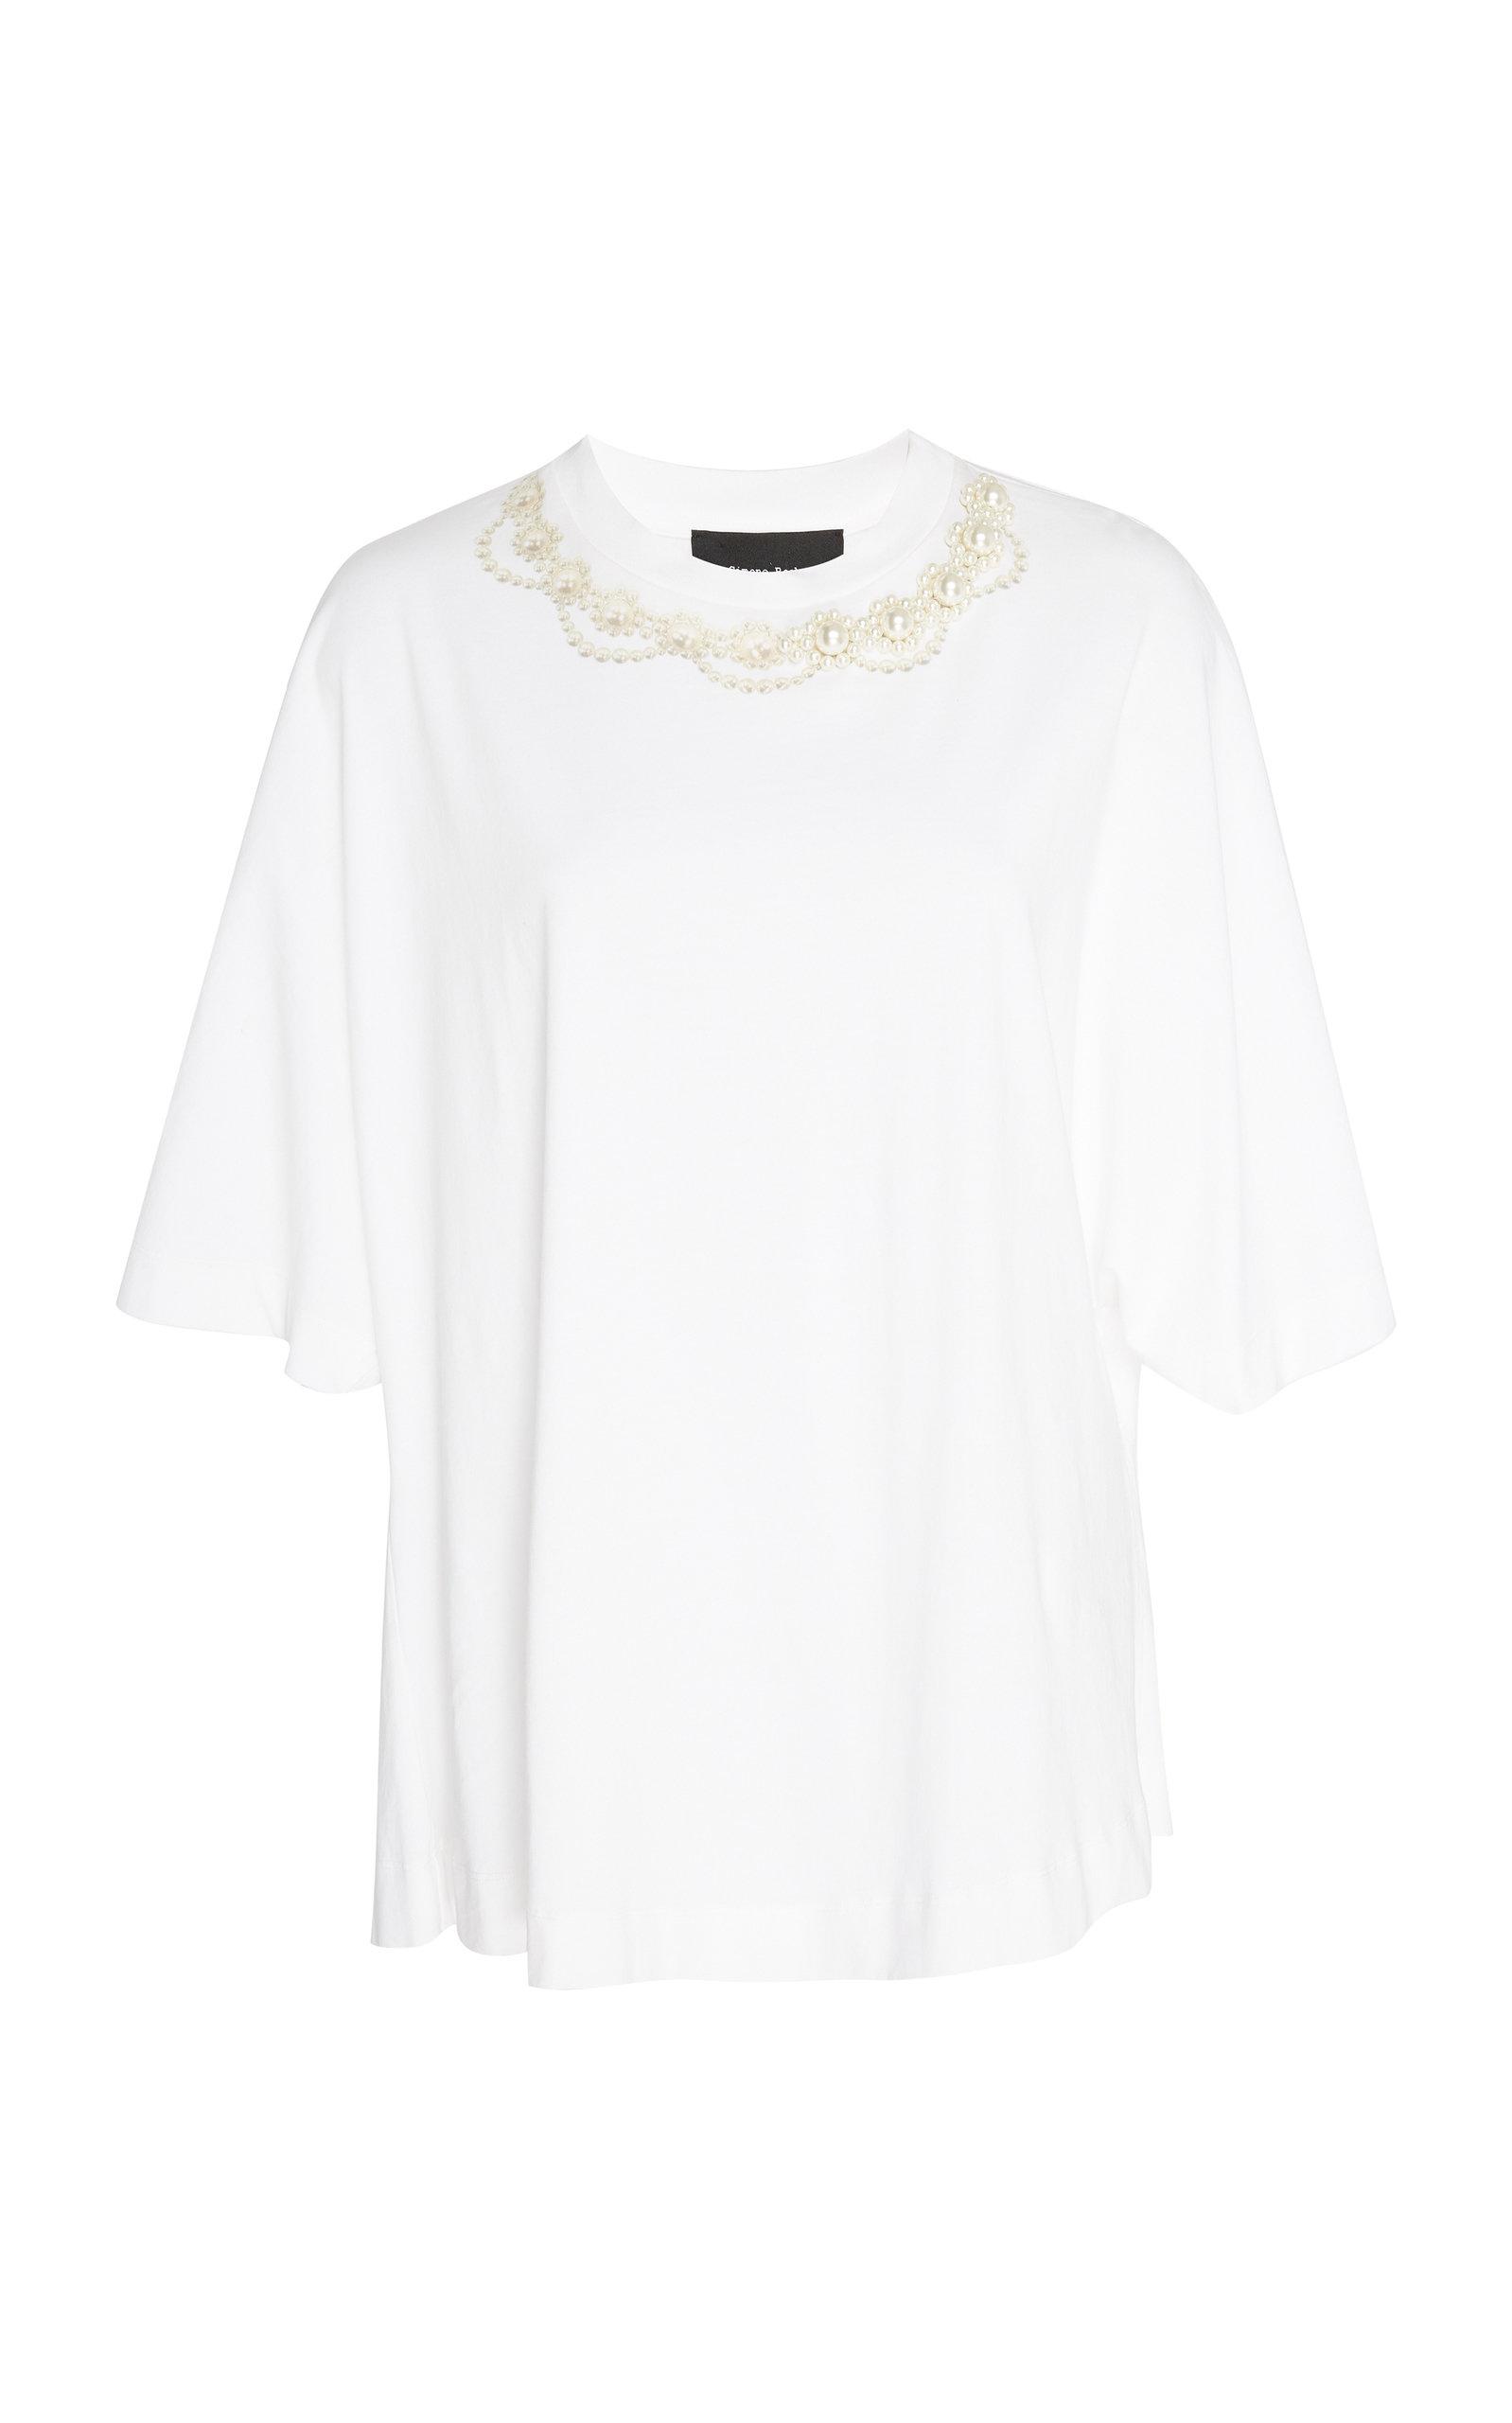 Simone Rocha T-shirts FAUX PEARL-EMBELLISHED COTTON-JERSEY T-SHIRT